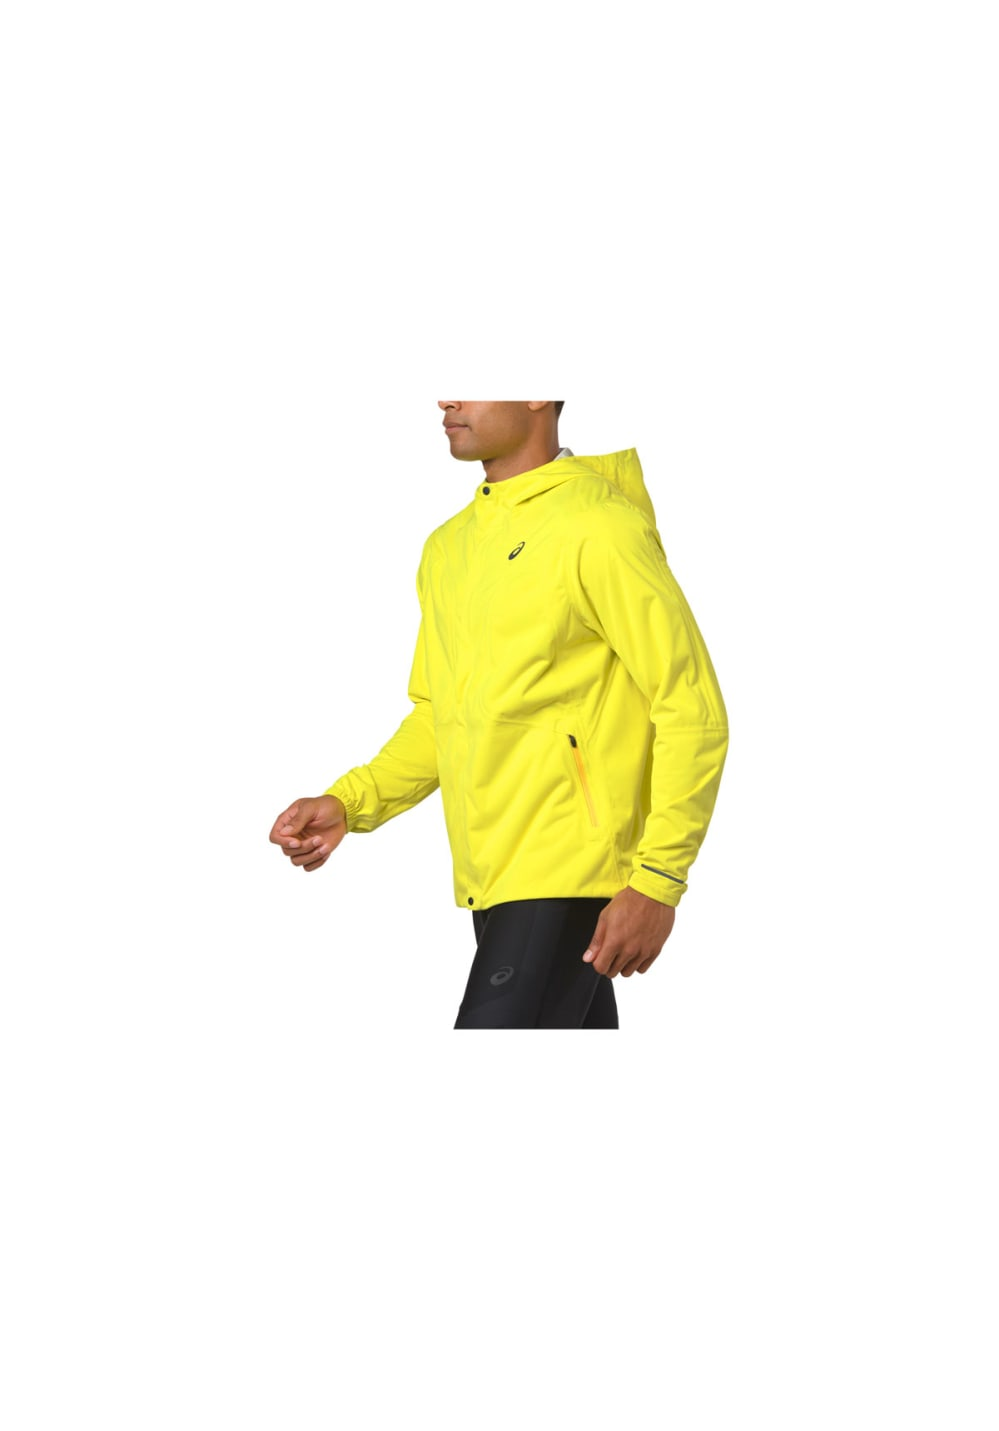 ASICS Accelerate Jacket Laufjacken für Herren Gelb